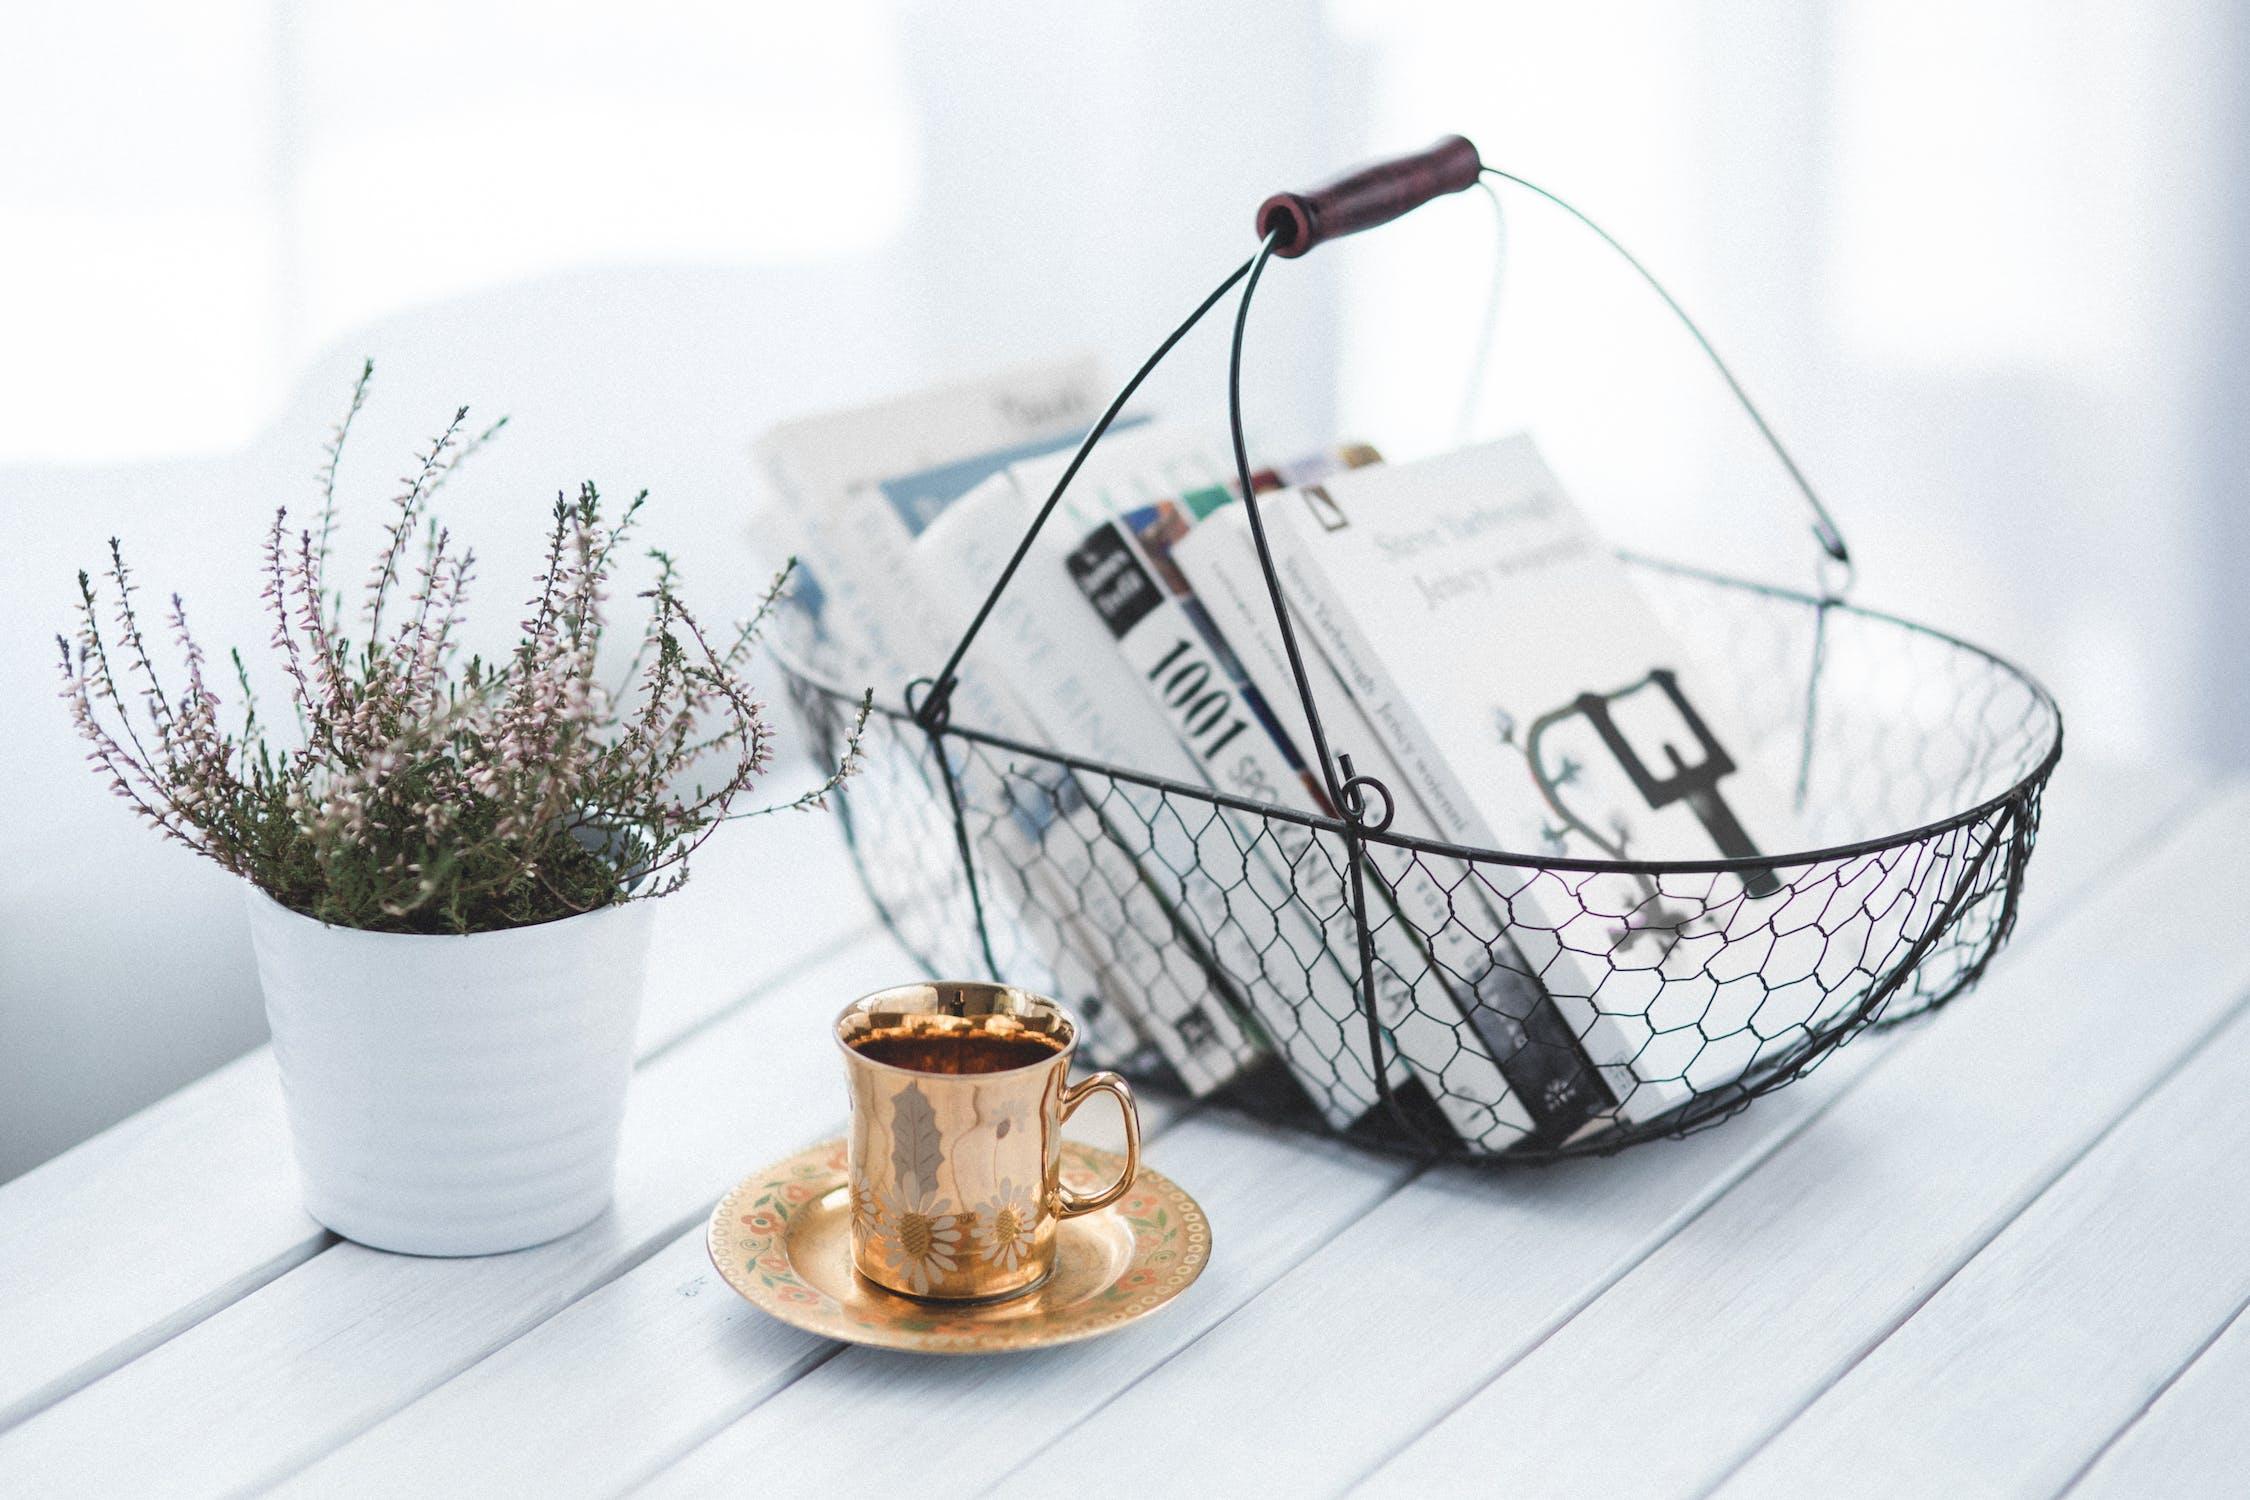 https://images.pexels.com/photos/6332/coffee-cup-books-home.jpg?auto=compress&cs=tinysrgb&dpr=2&h=750&w=1260